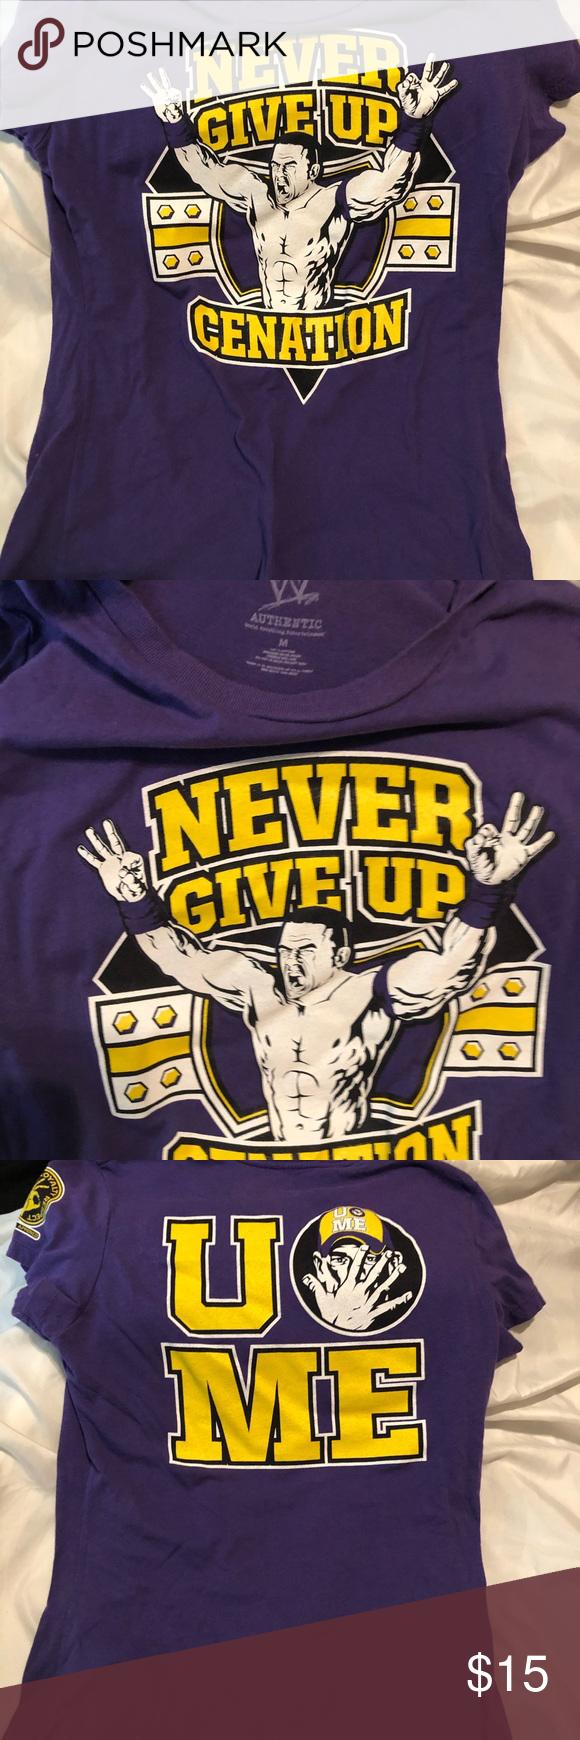 WWE John Cena John cena, Wwe, Never give up